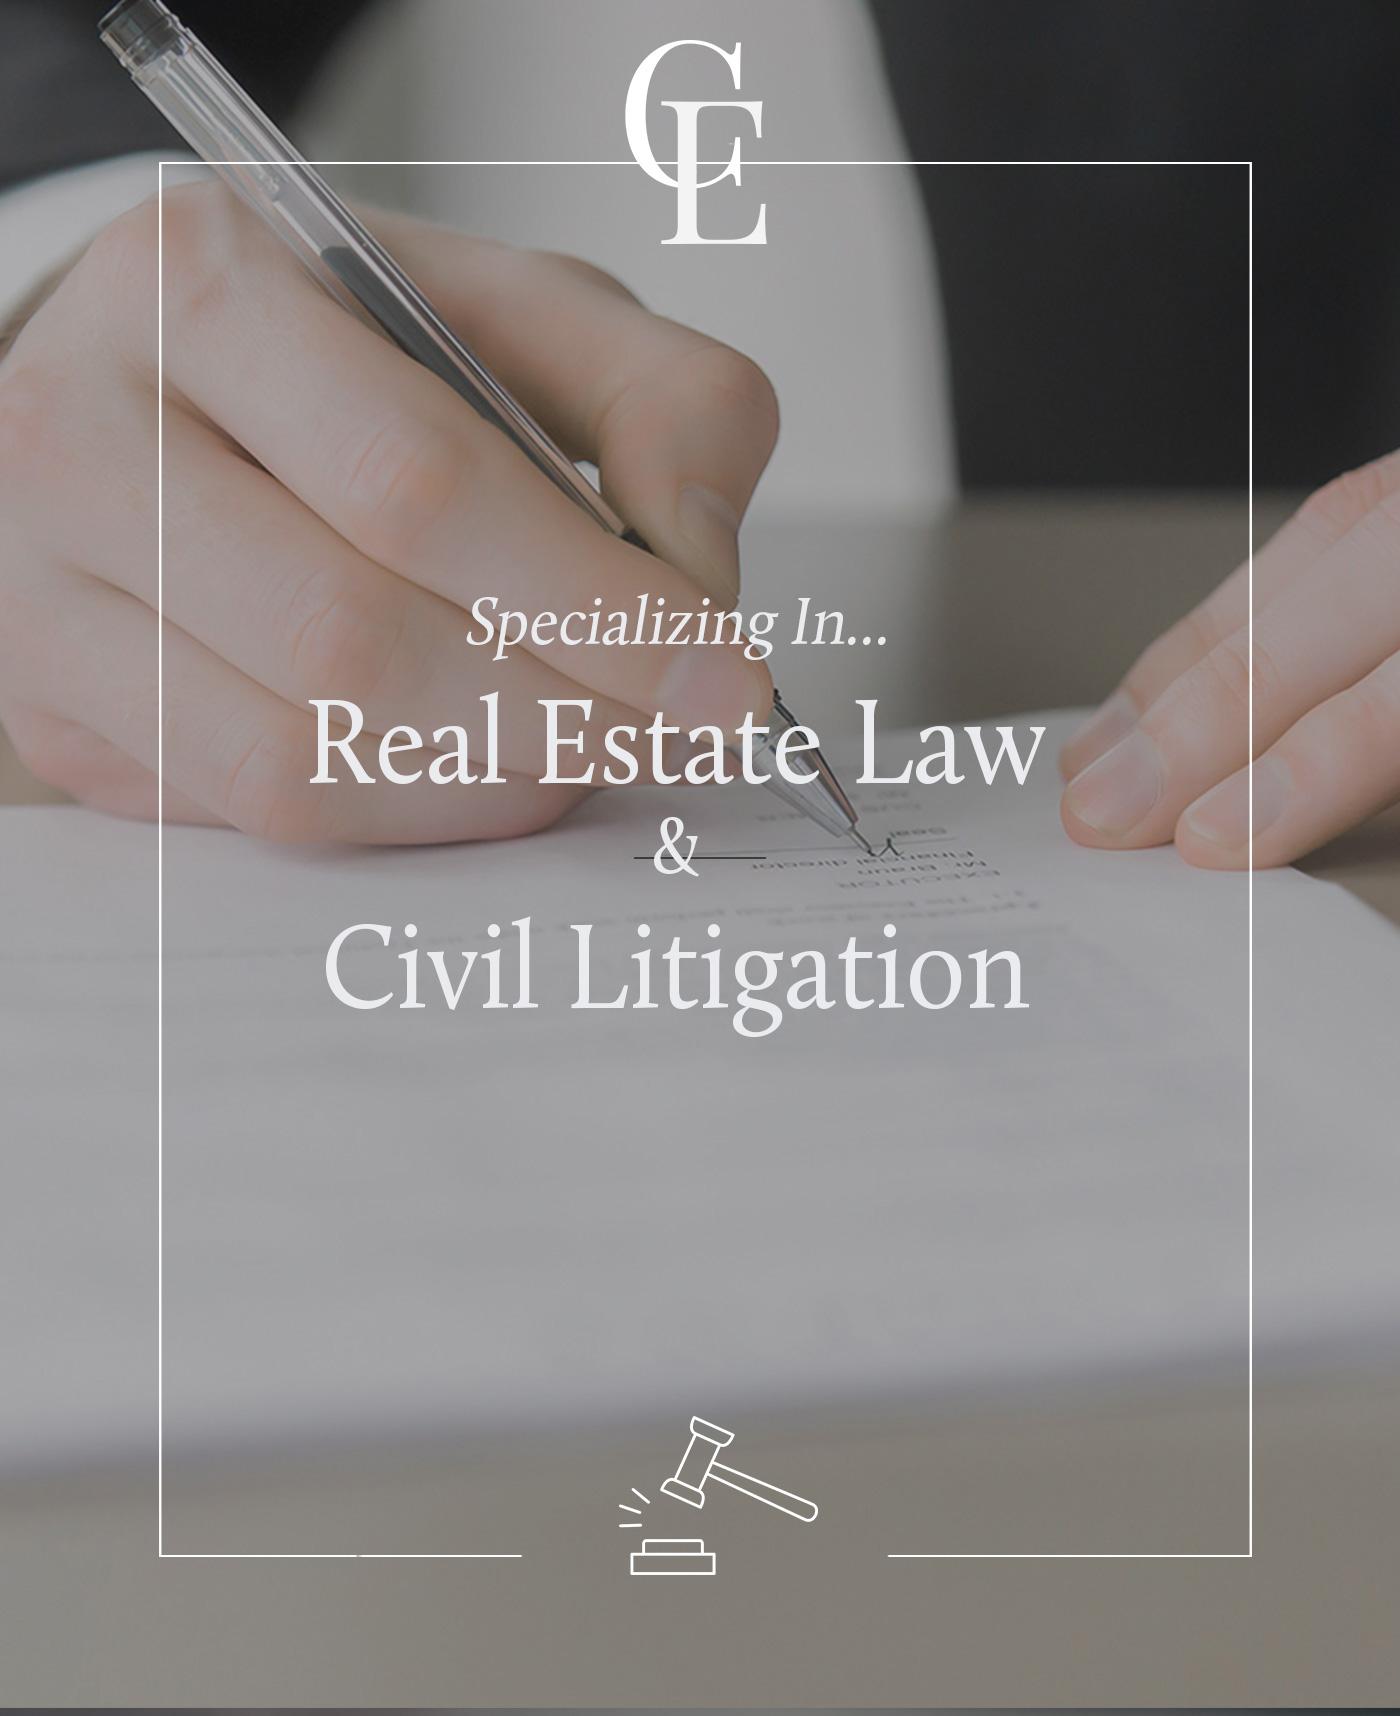 Real-Estate-Attorney-2.jpg